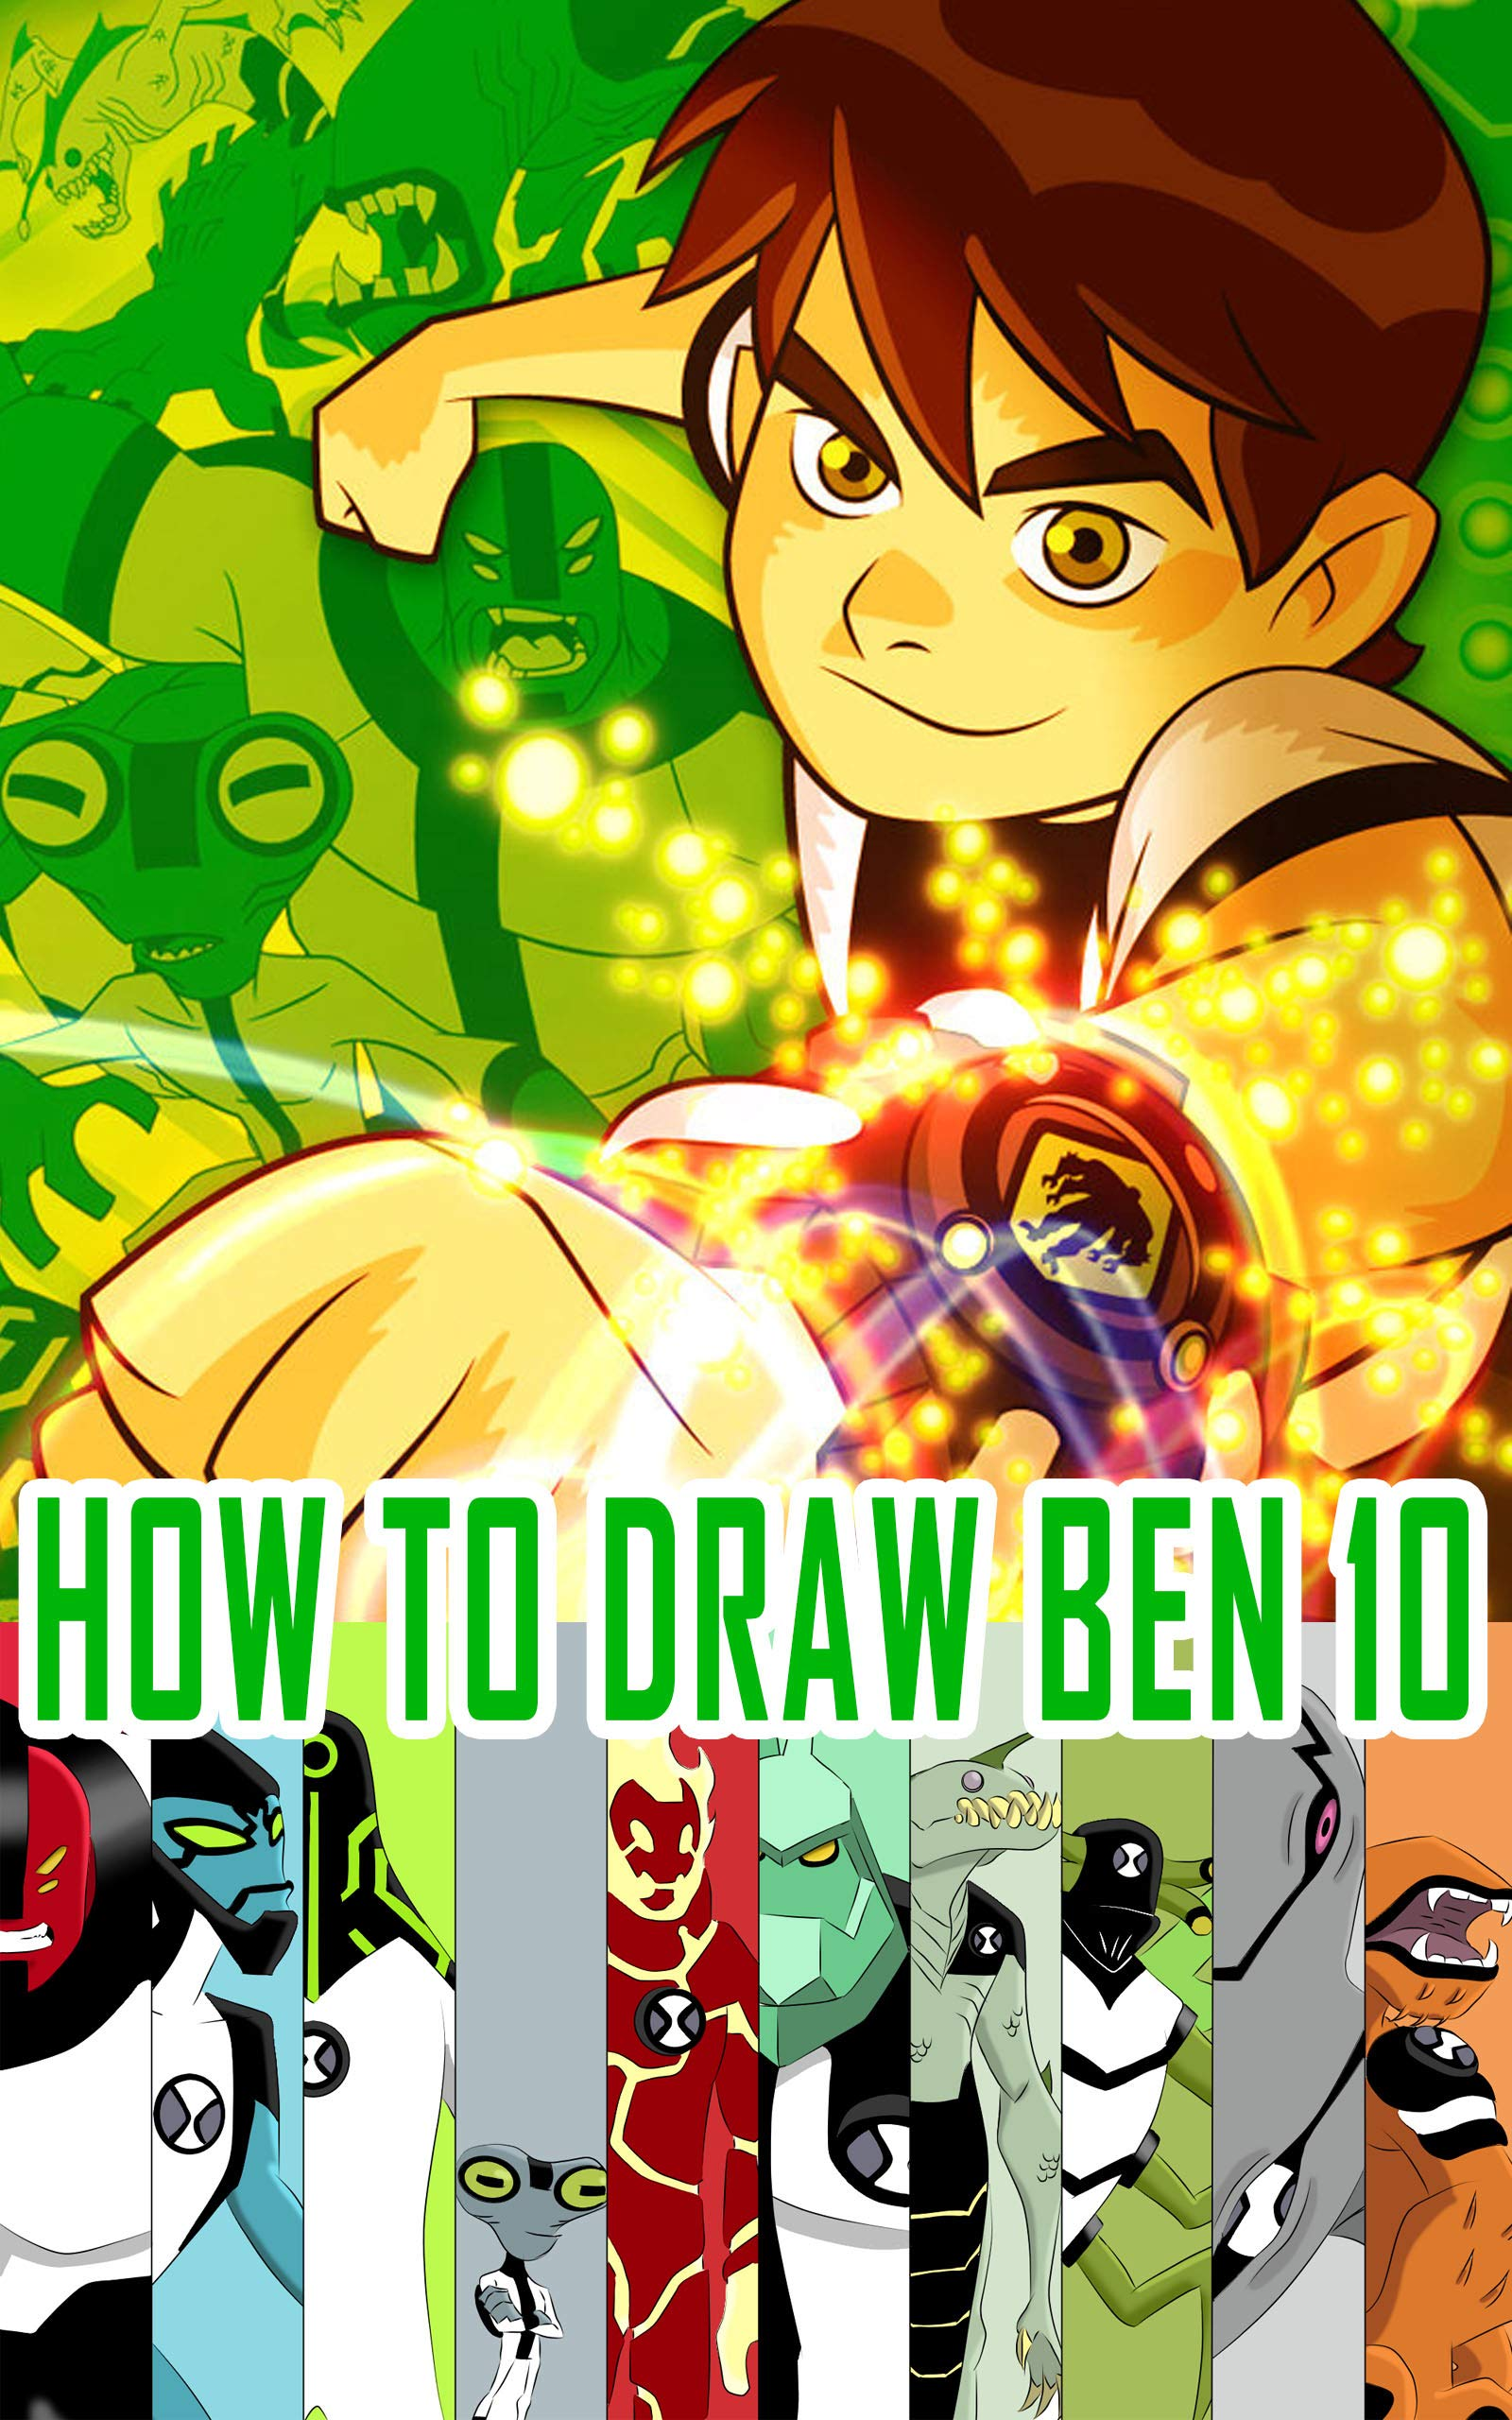 How To Draw Ben 10 Heatblast Ben 10 Cannonbolt Xlr8 Way Big Four Arms Feedback Stinkfly Humungousaur Diamondhead Drawing Ben 10 Most Wished Reminder33on